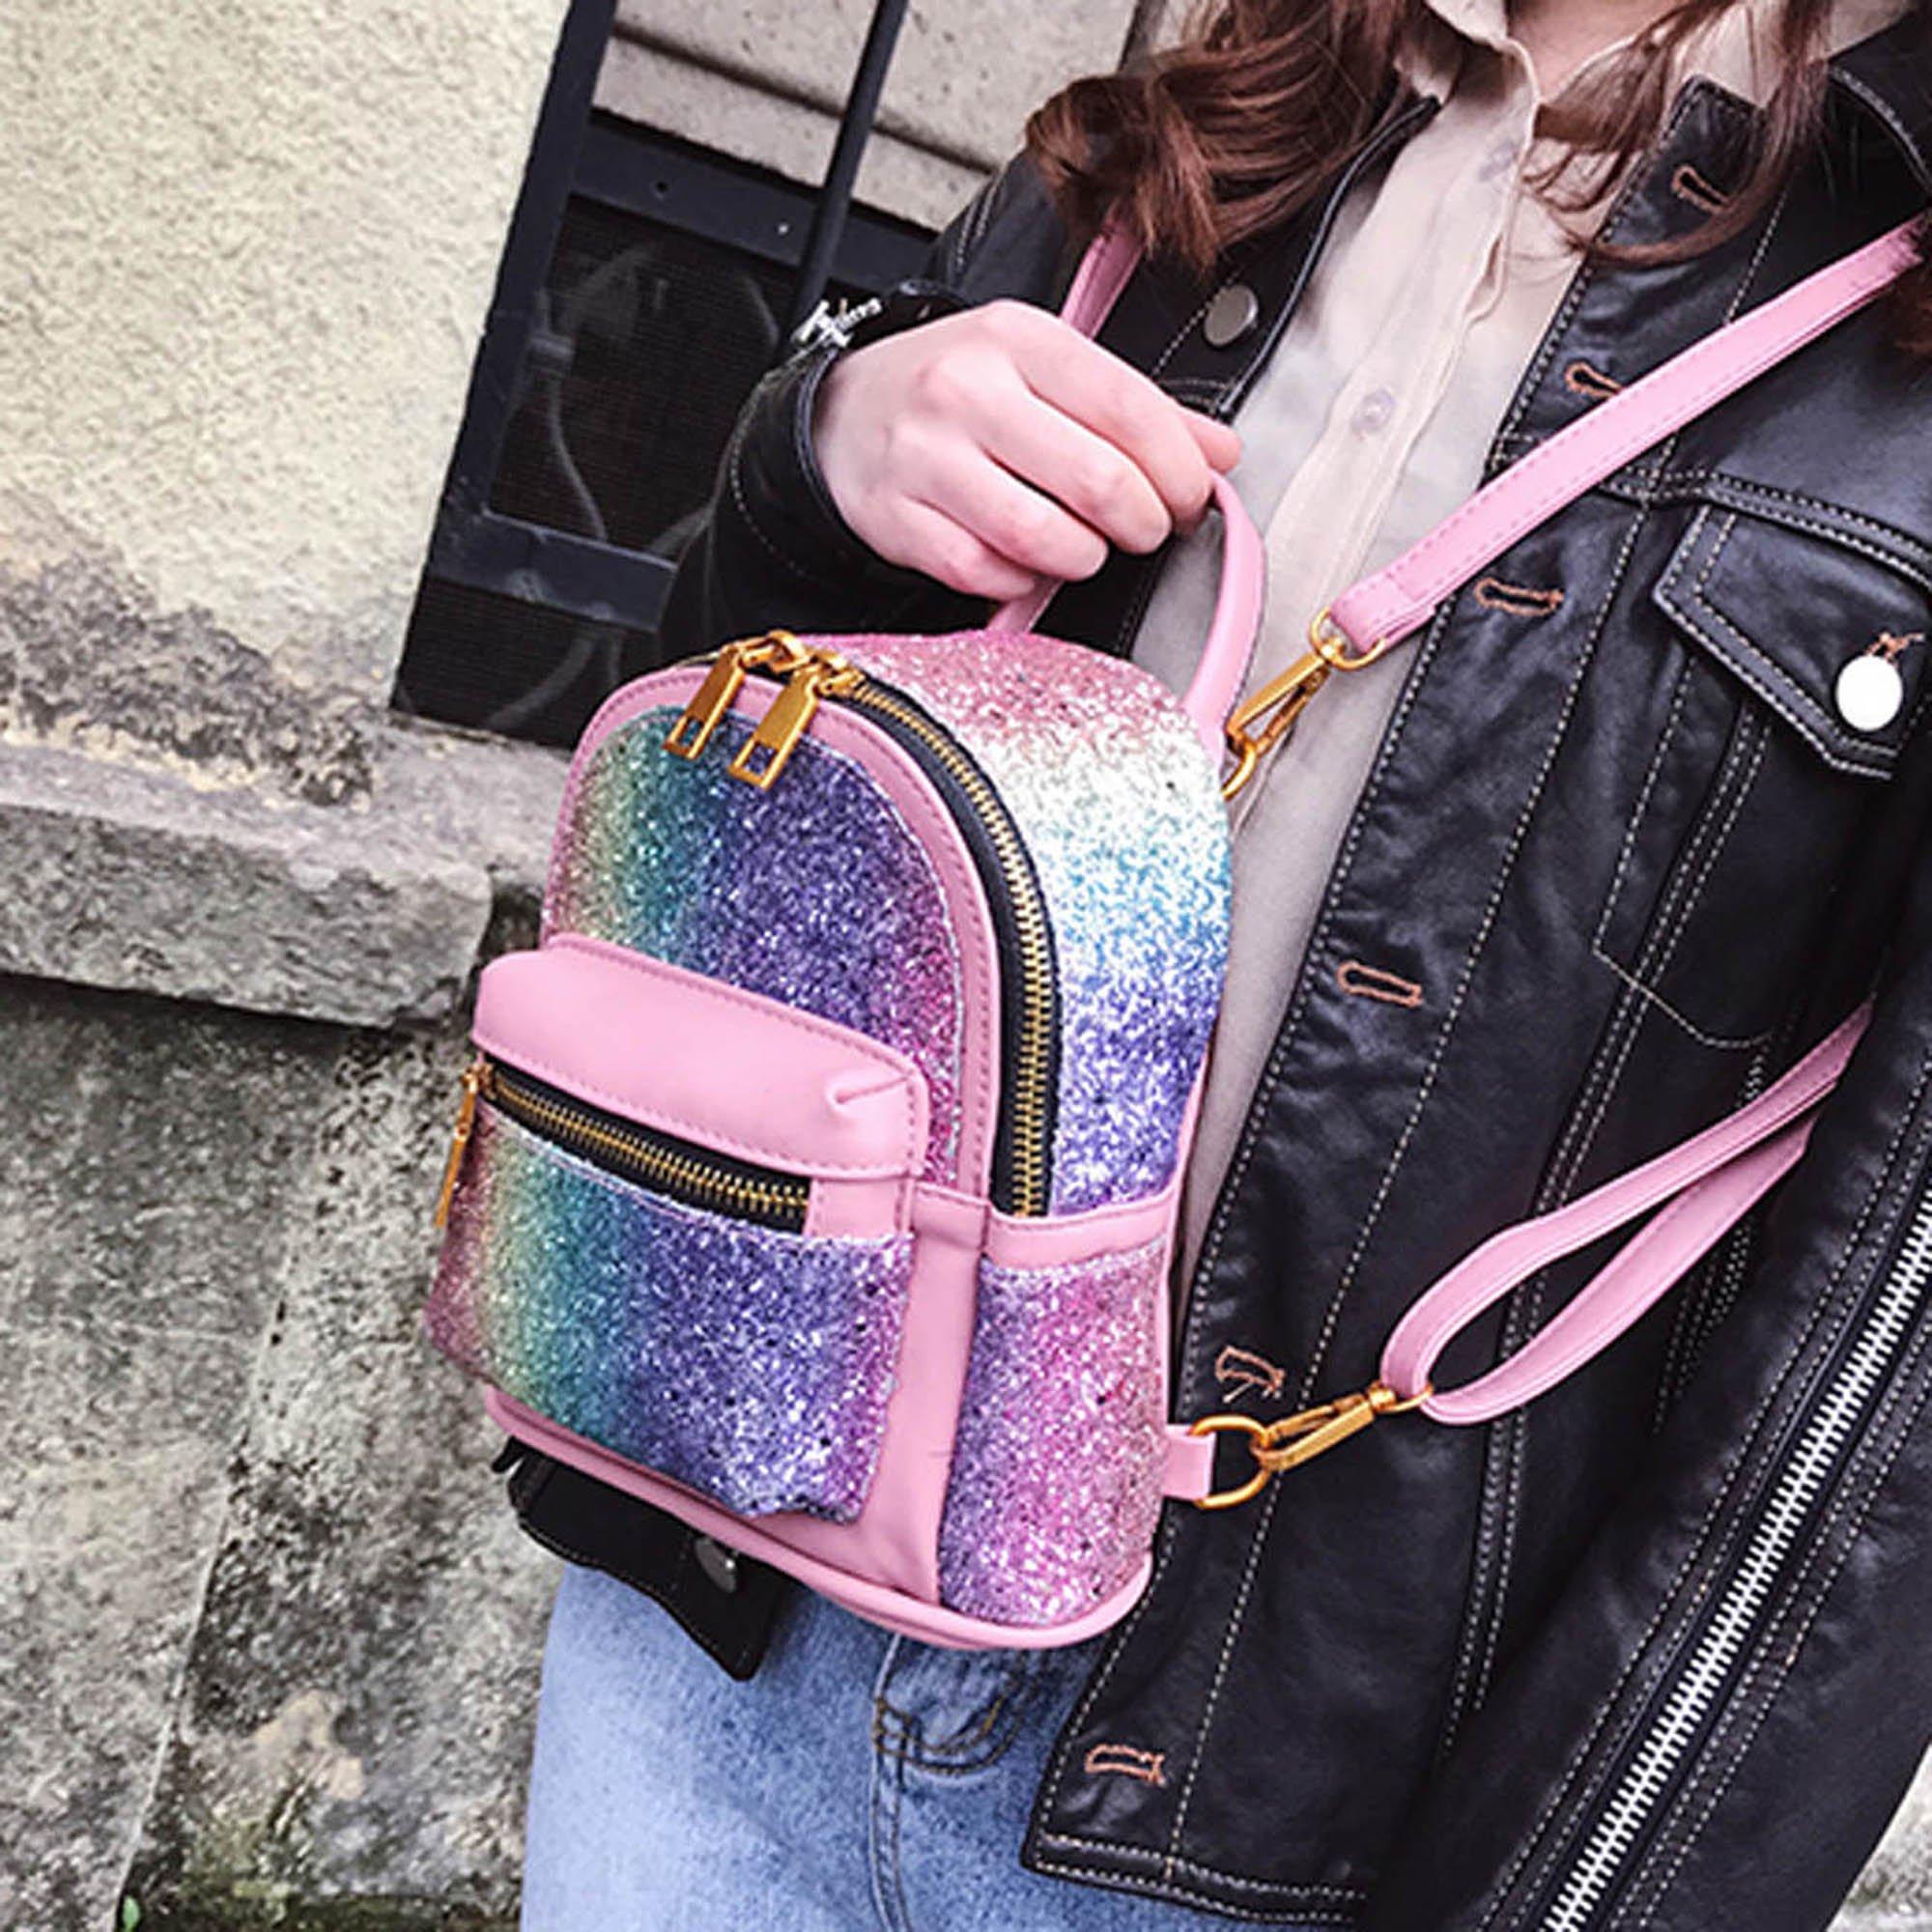 Girls Bling Mini Travel Backpack Kids Children School Bags Satchel Purses Daypack (pink rainbow) by JIANBAO (Image #6)